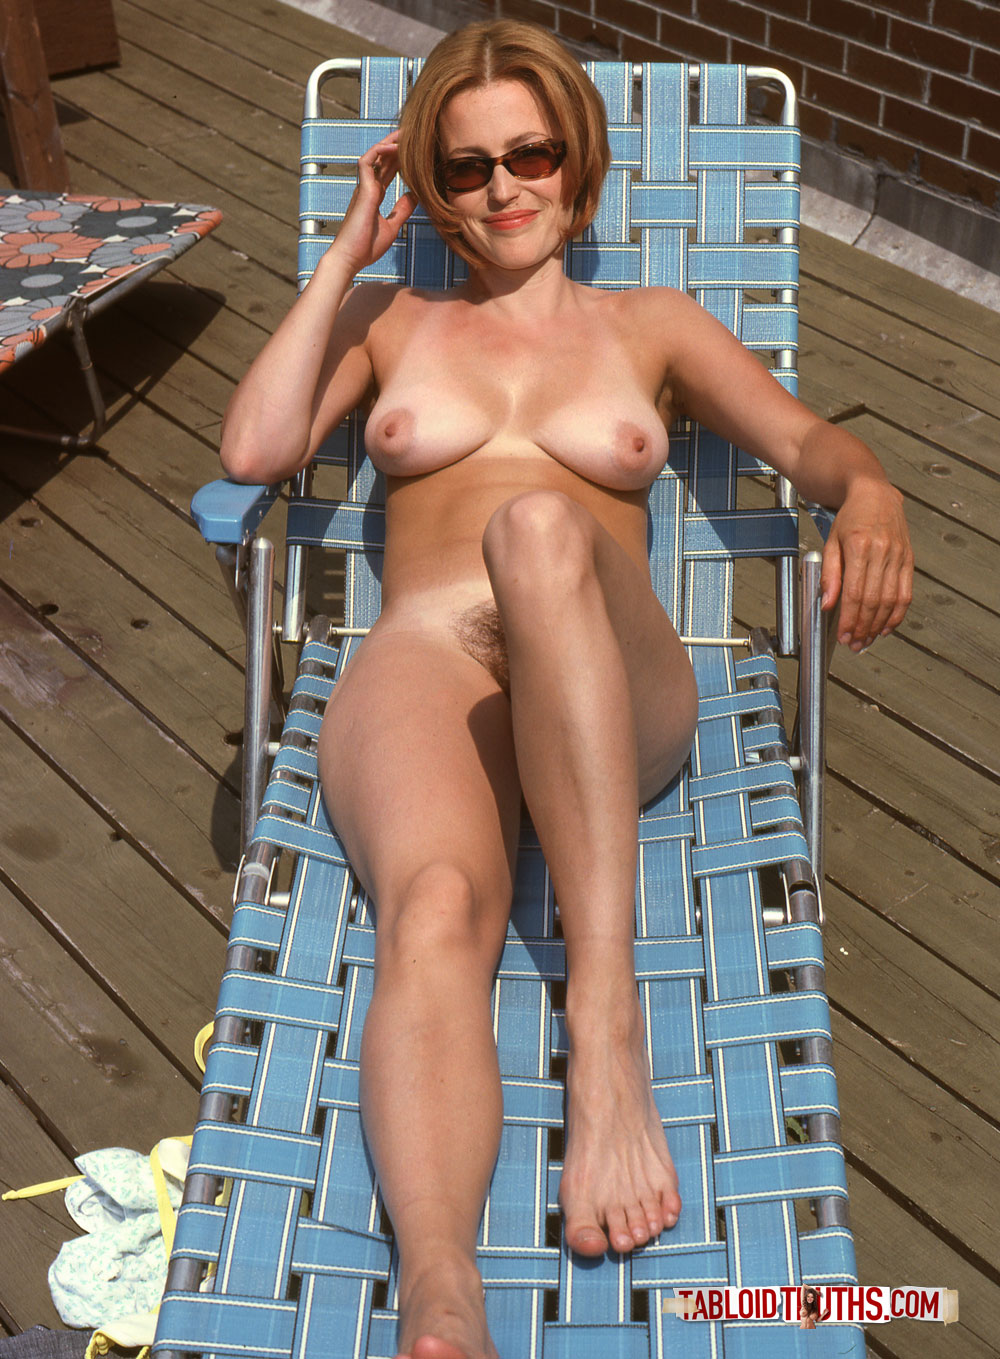 Tara reid nude body shots 4